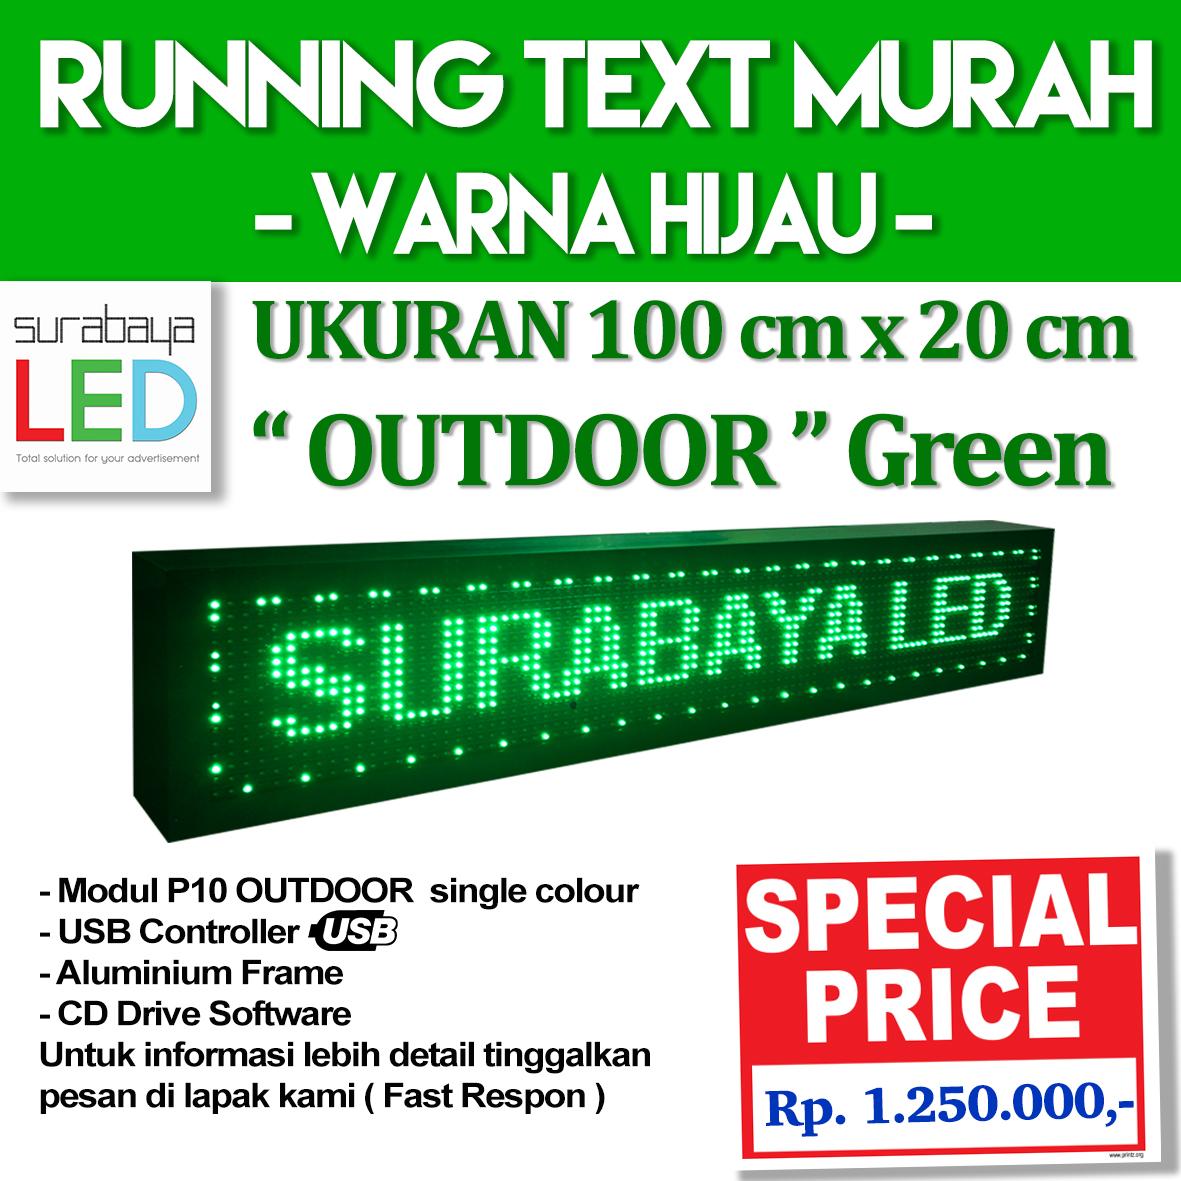 Jual Running Text Outdoor Murah Warna Hijau Uk 100 X 20cm Surabaya Modul Panel Led P10 Green Tokopedia